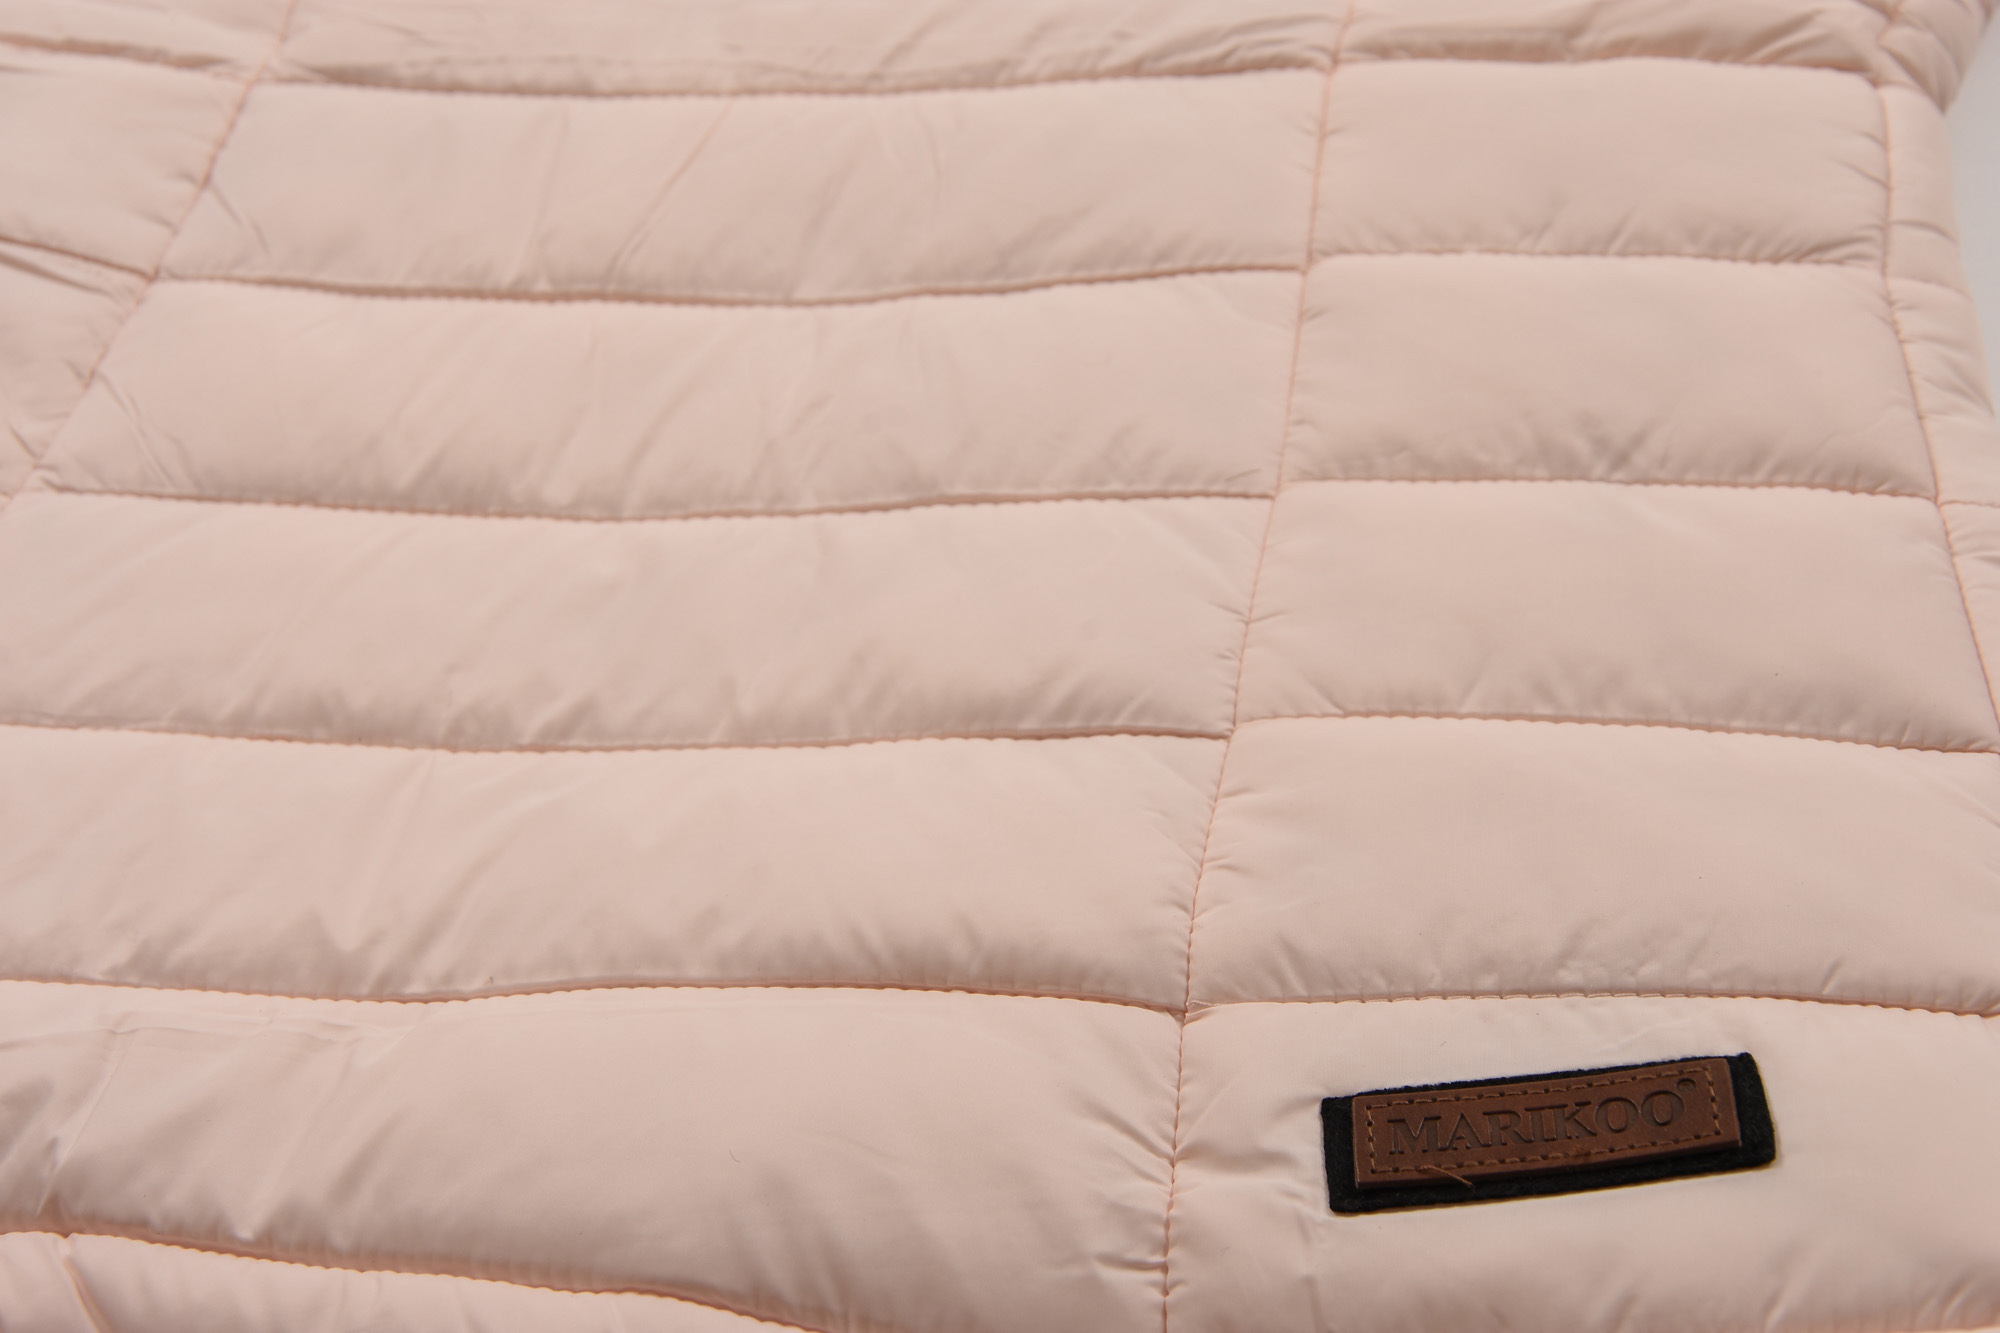 Marikoo-Lucy-Damen-Jacke-Steppjacke-Ubergangsjacke-gesteppt-Stepp-NEU-B651 Indexbild 42